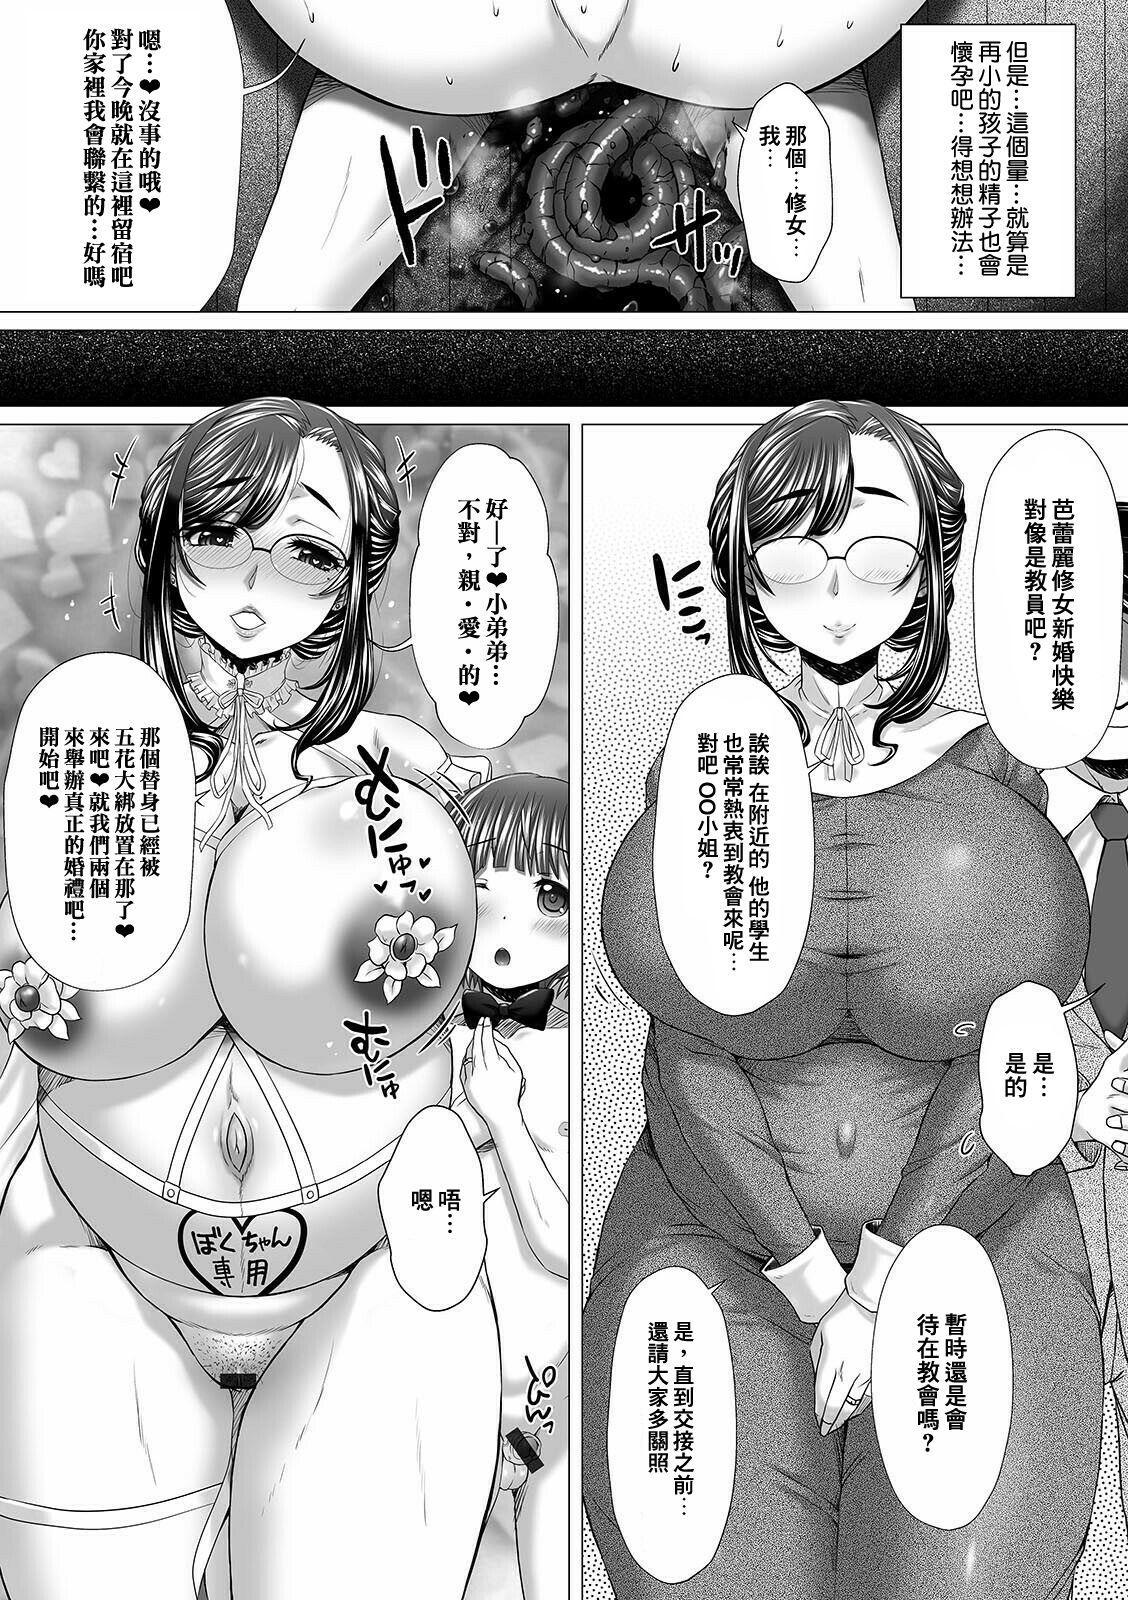 GOFUJYO Sister Chou 2 12